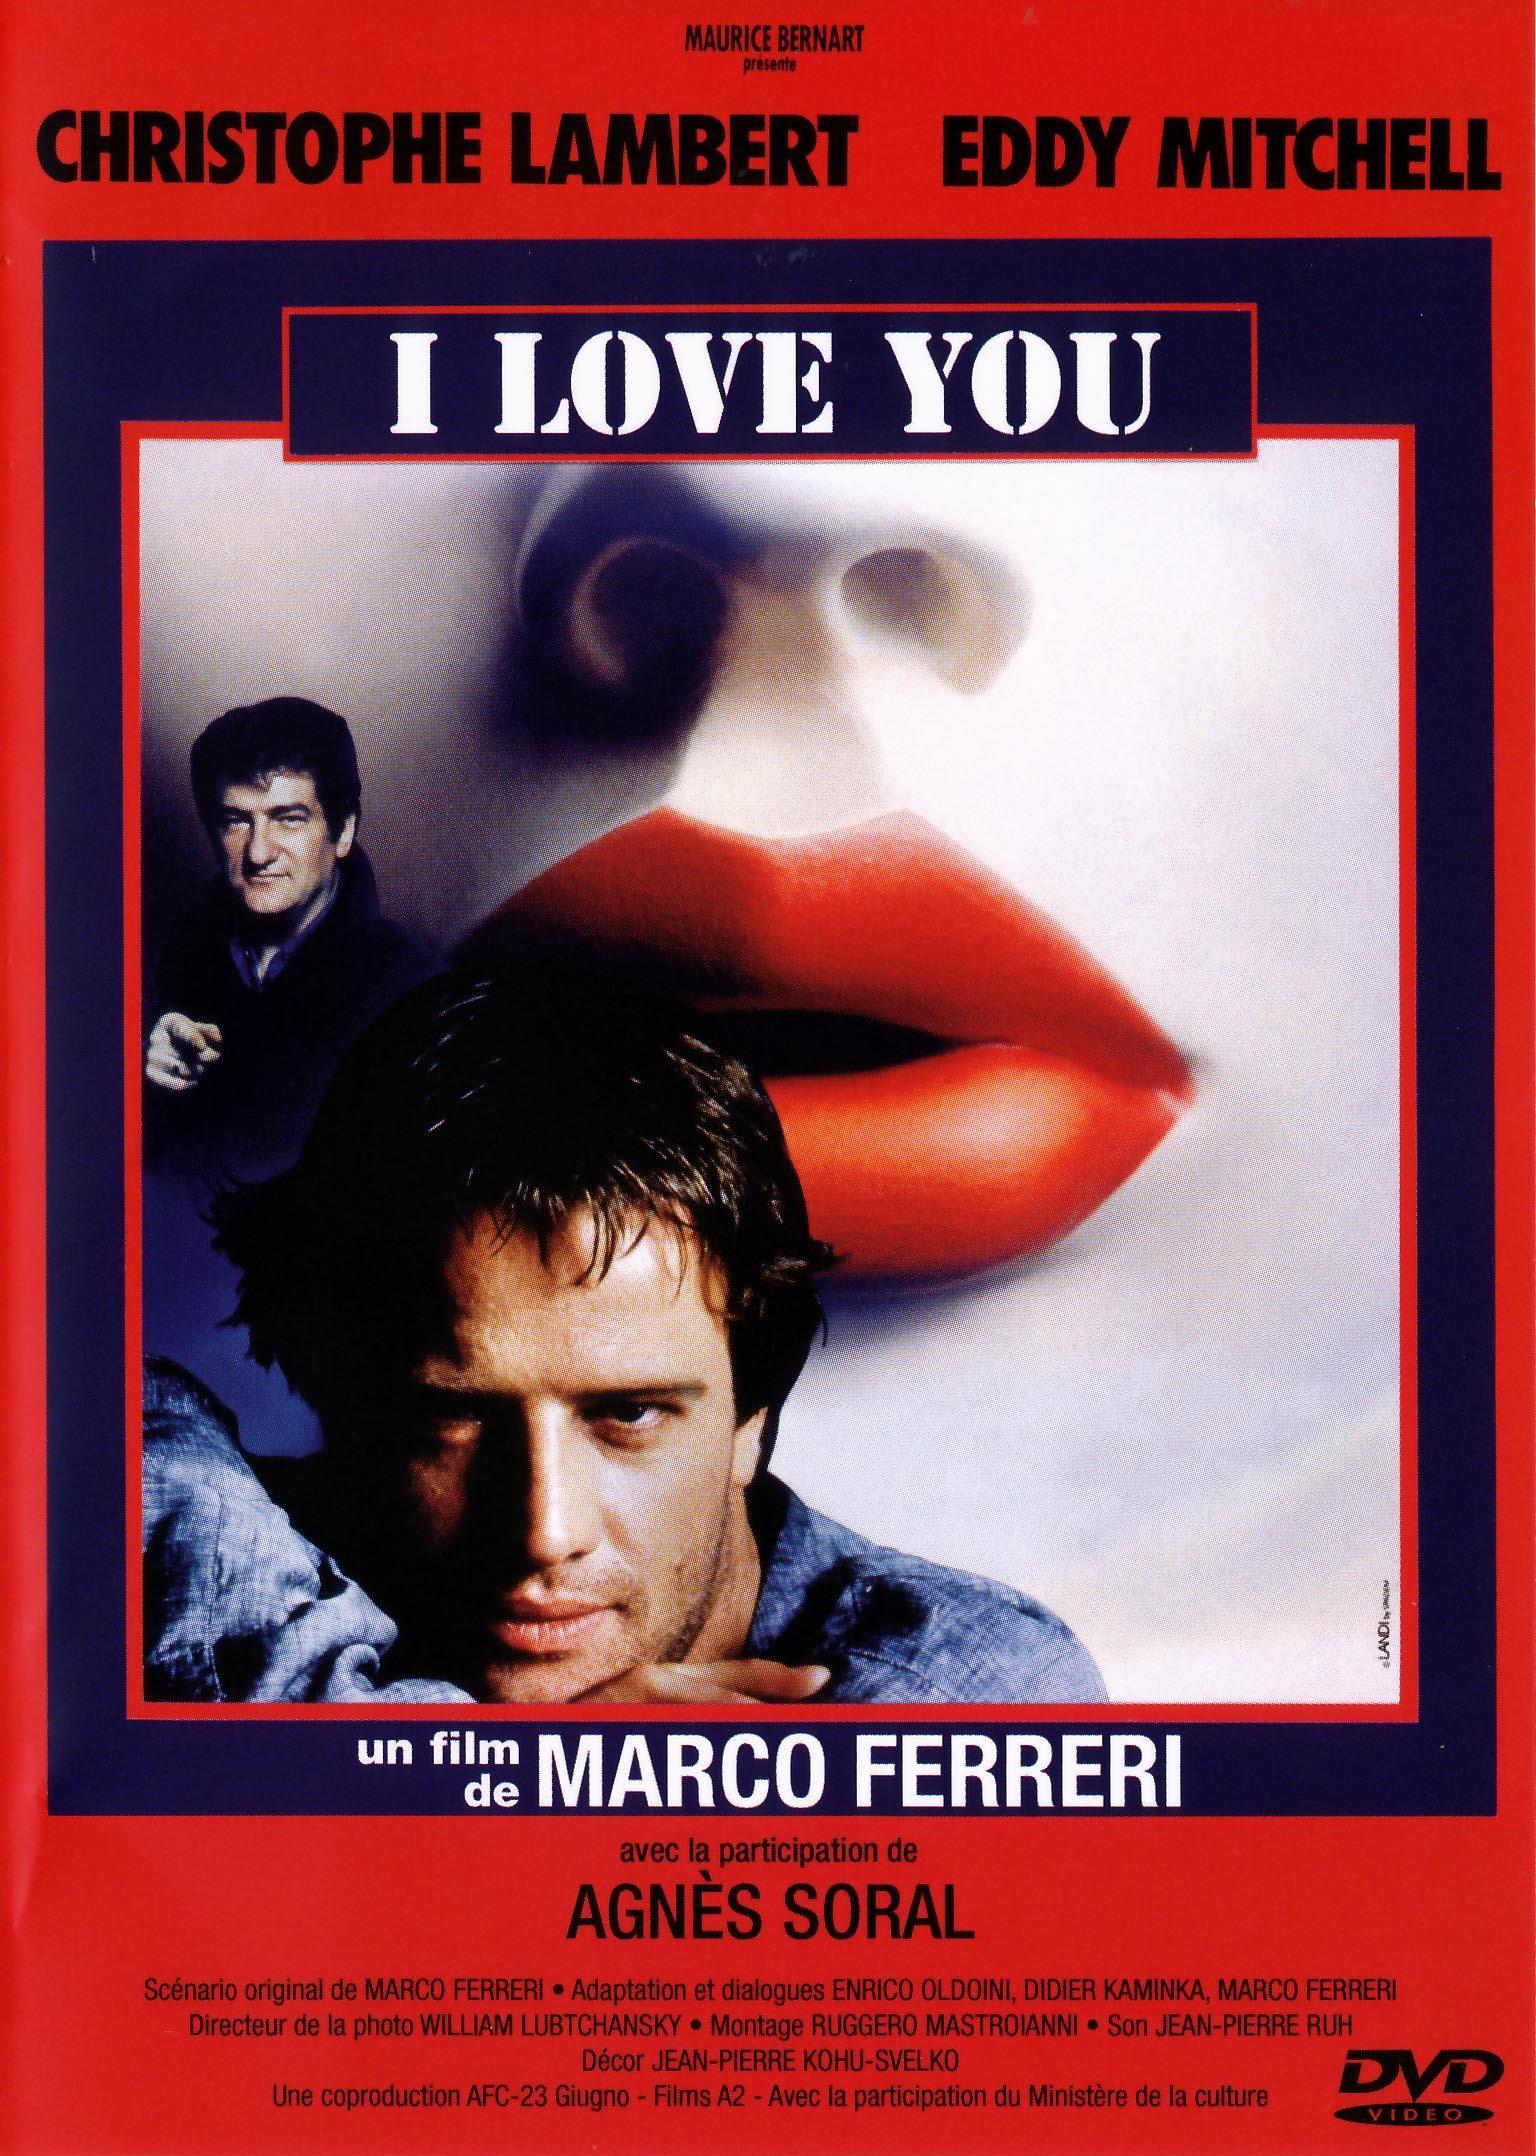 I love you - dvd